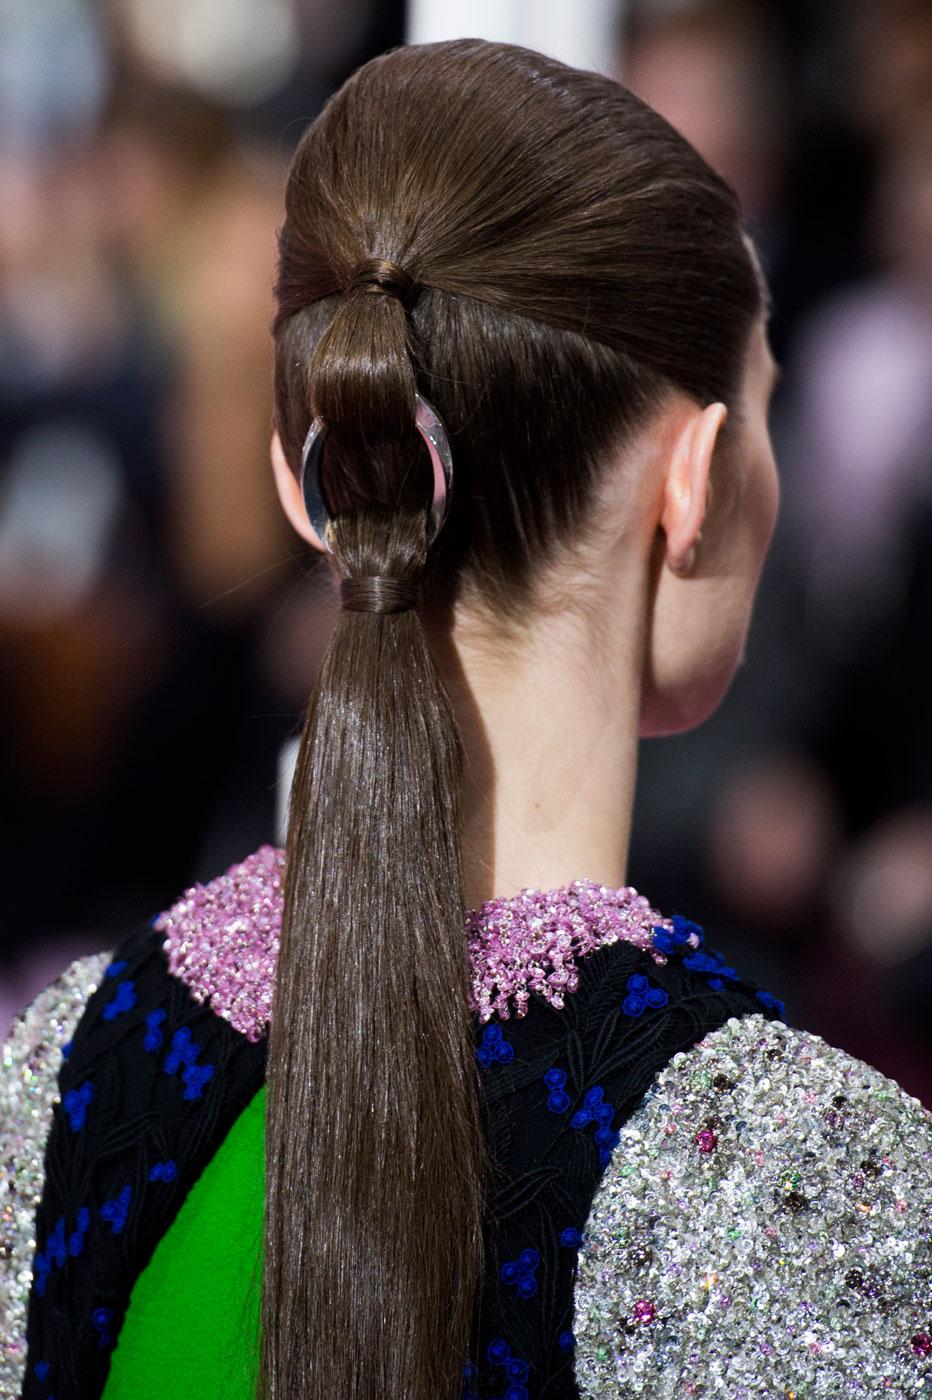 Christian-Dior-fashion-runway-show-close-ups-haute-couture-paris-spring-summer-2015-the-impression-188